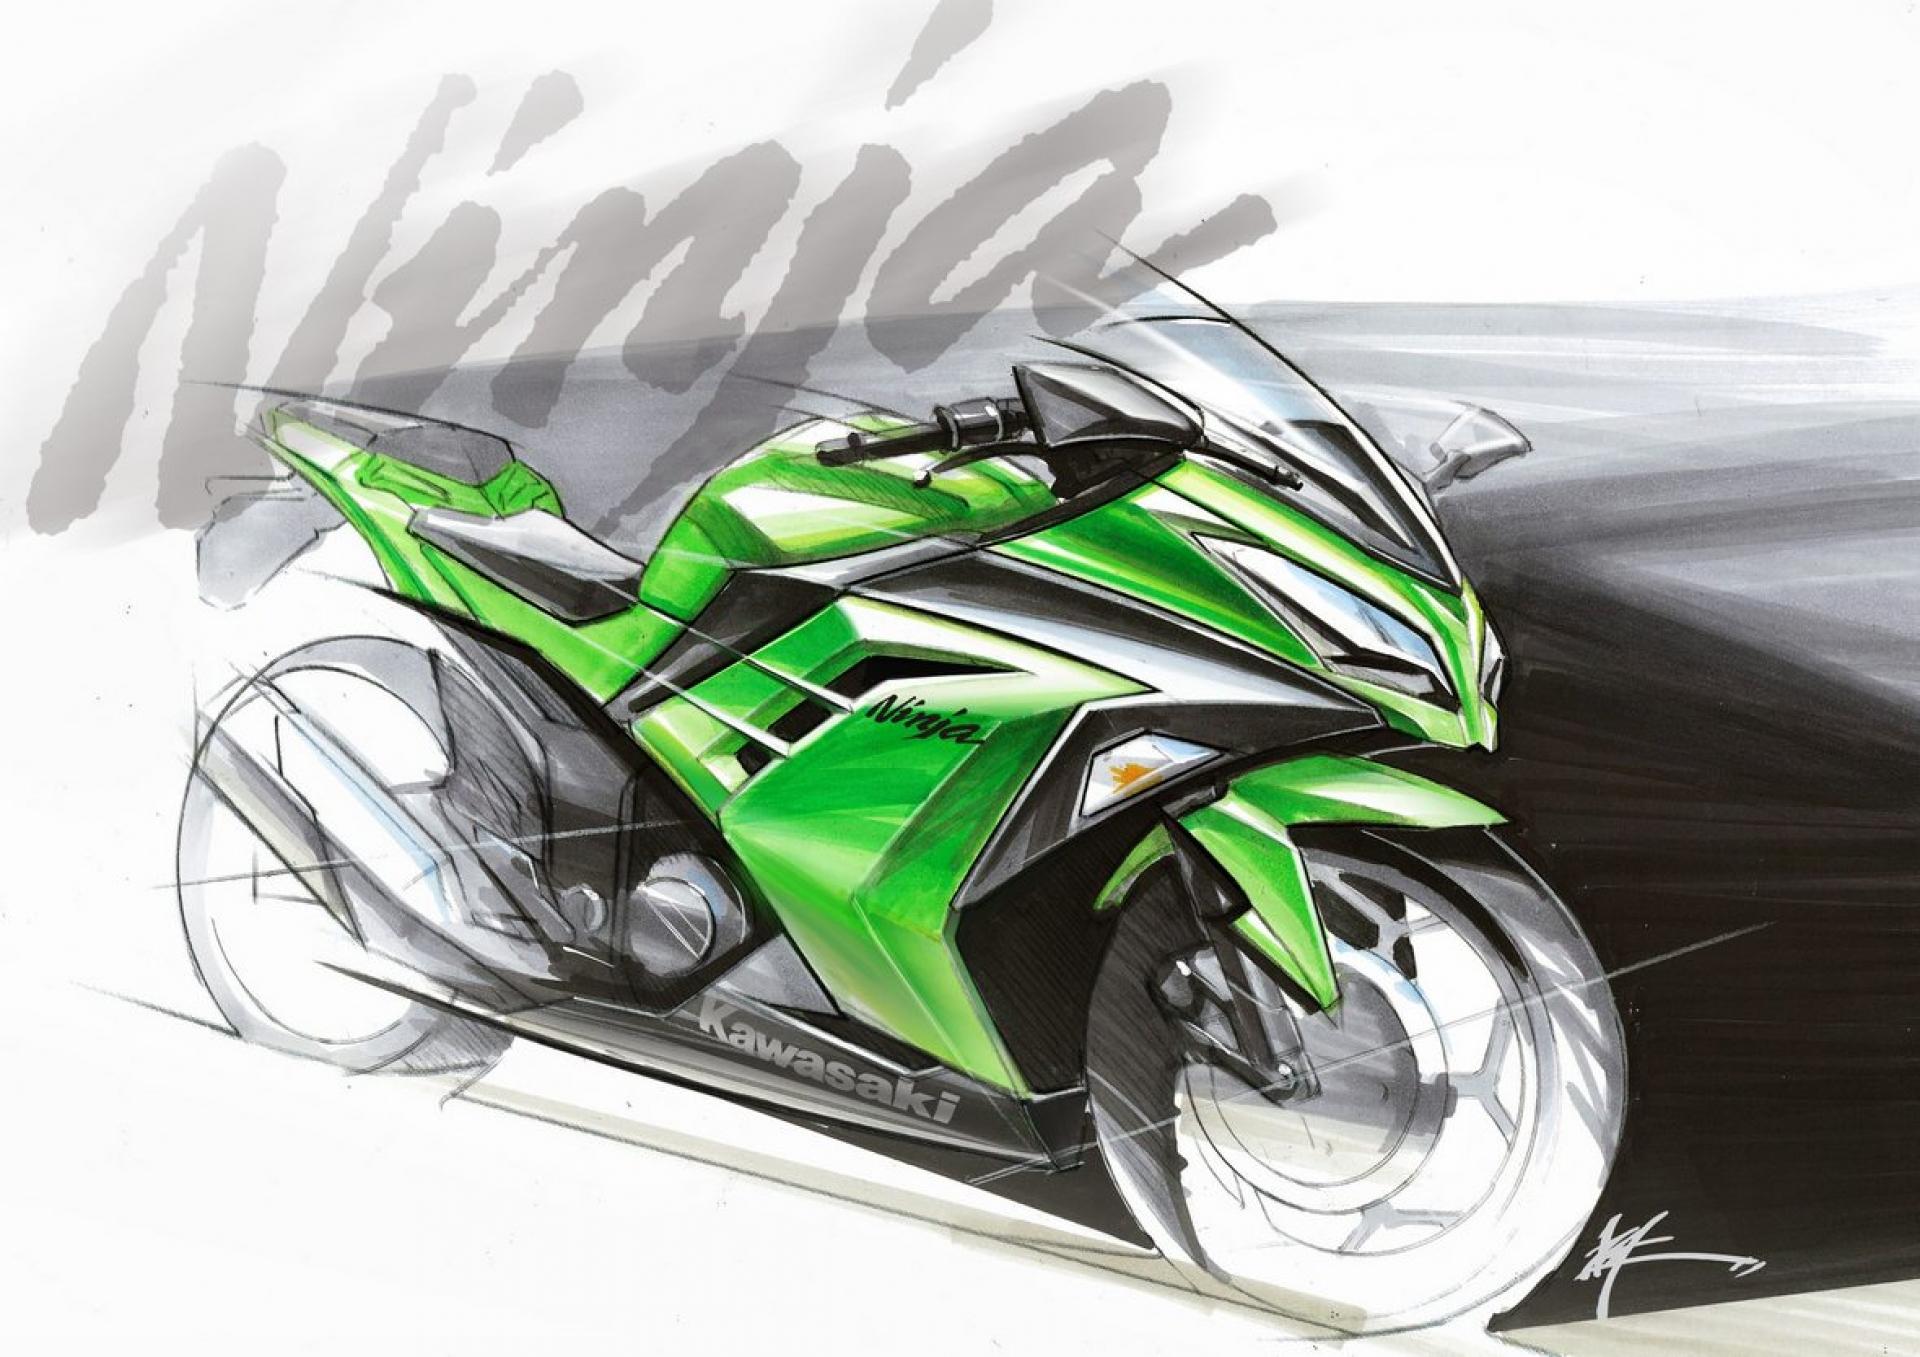 Kawasaki Ninja 300 Black Wallpaper Image 323 1920x1357